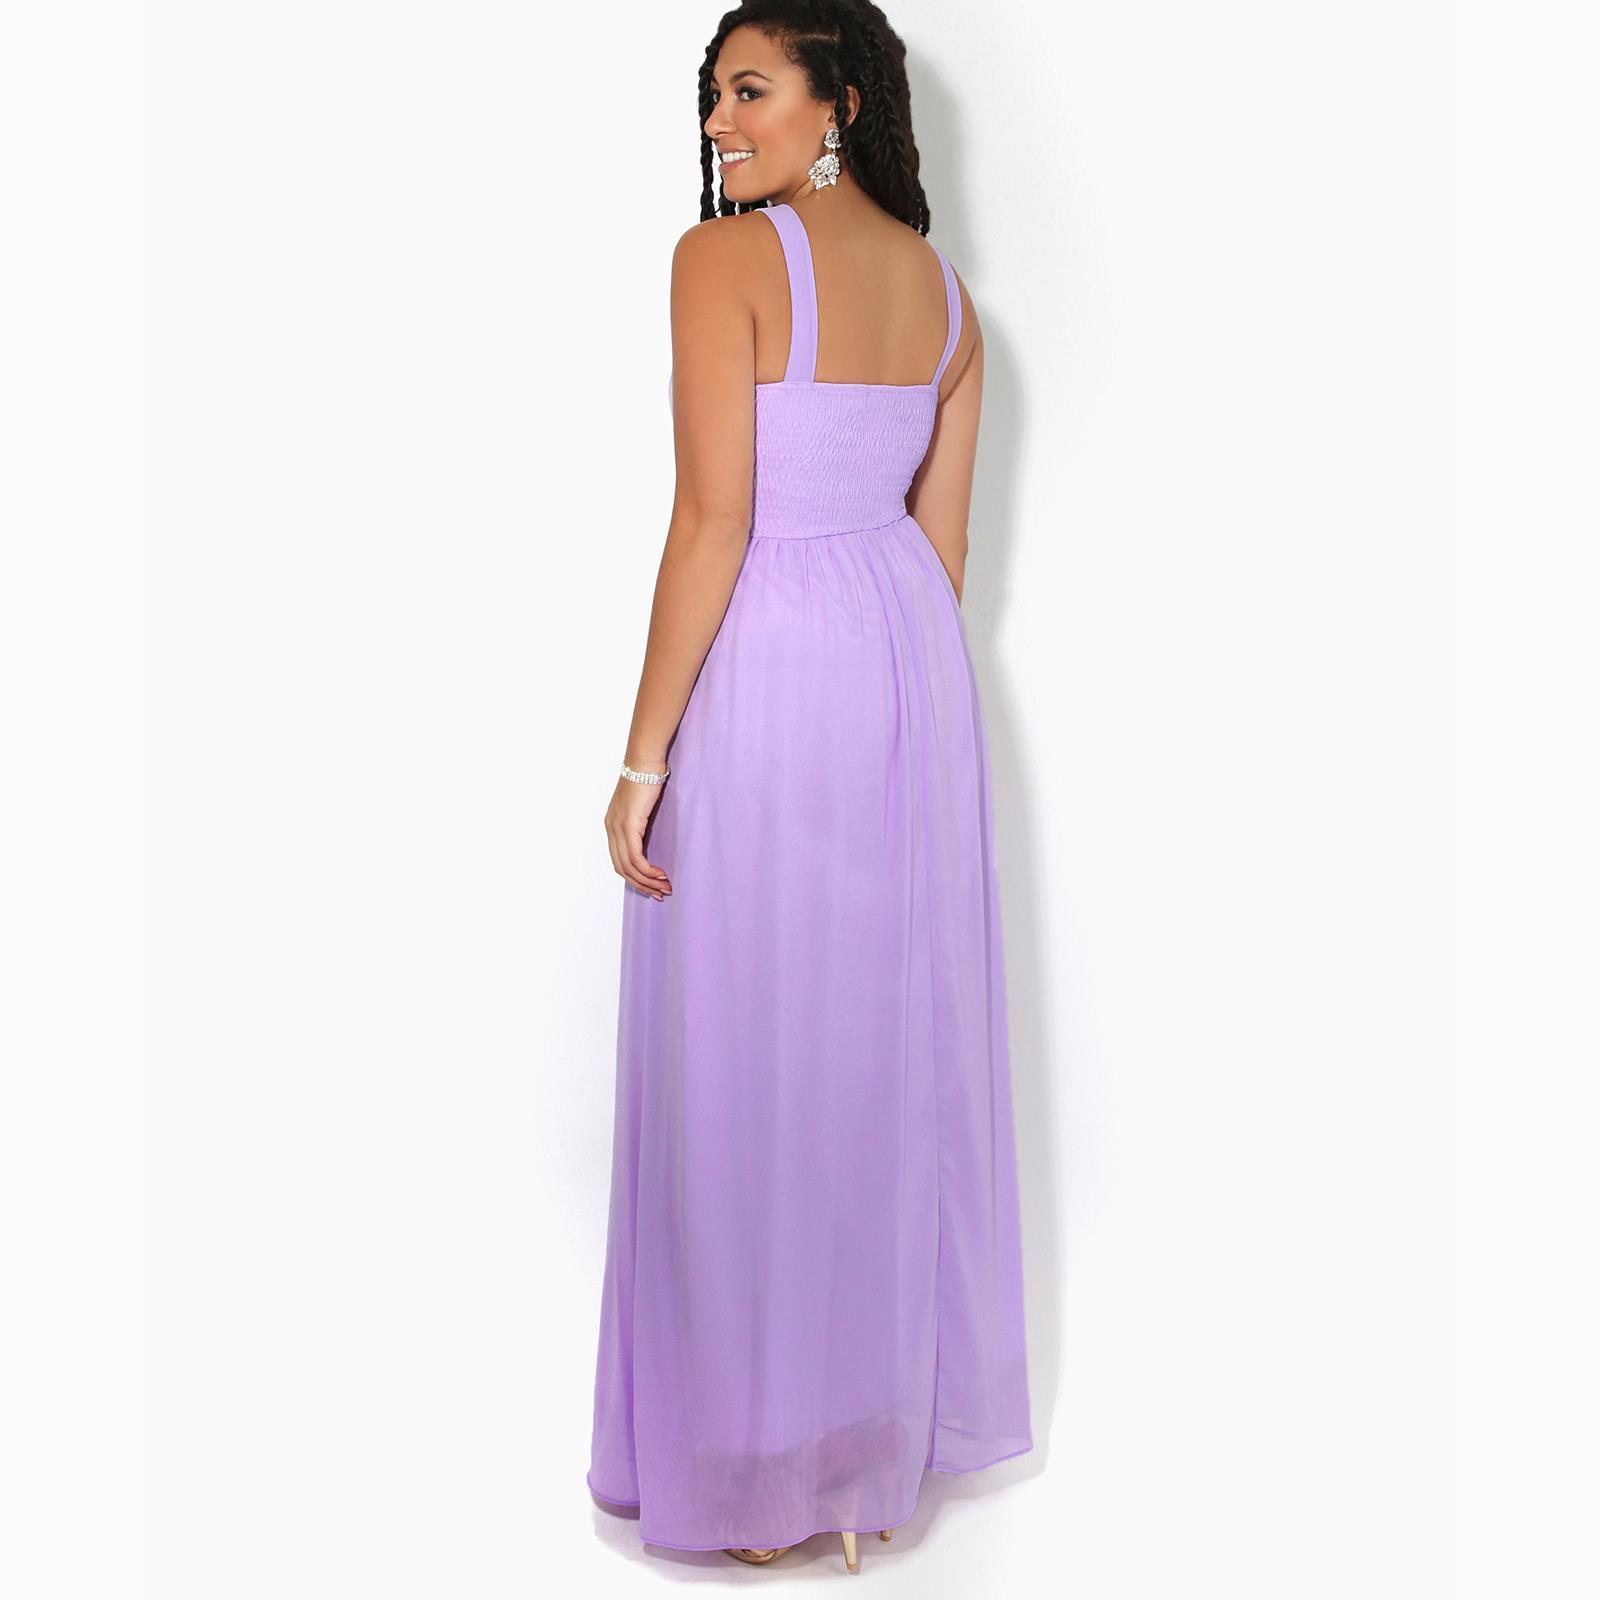 Women-Ladies-Long-Cocktail-Wedding-Bridesmaid-Evening-Maxi-Dress-Formal-Gown thumbnail 11